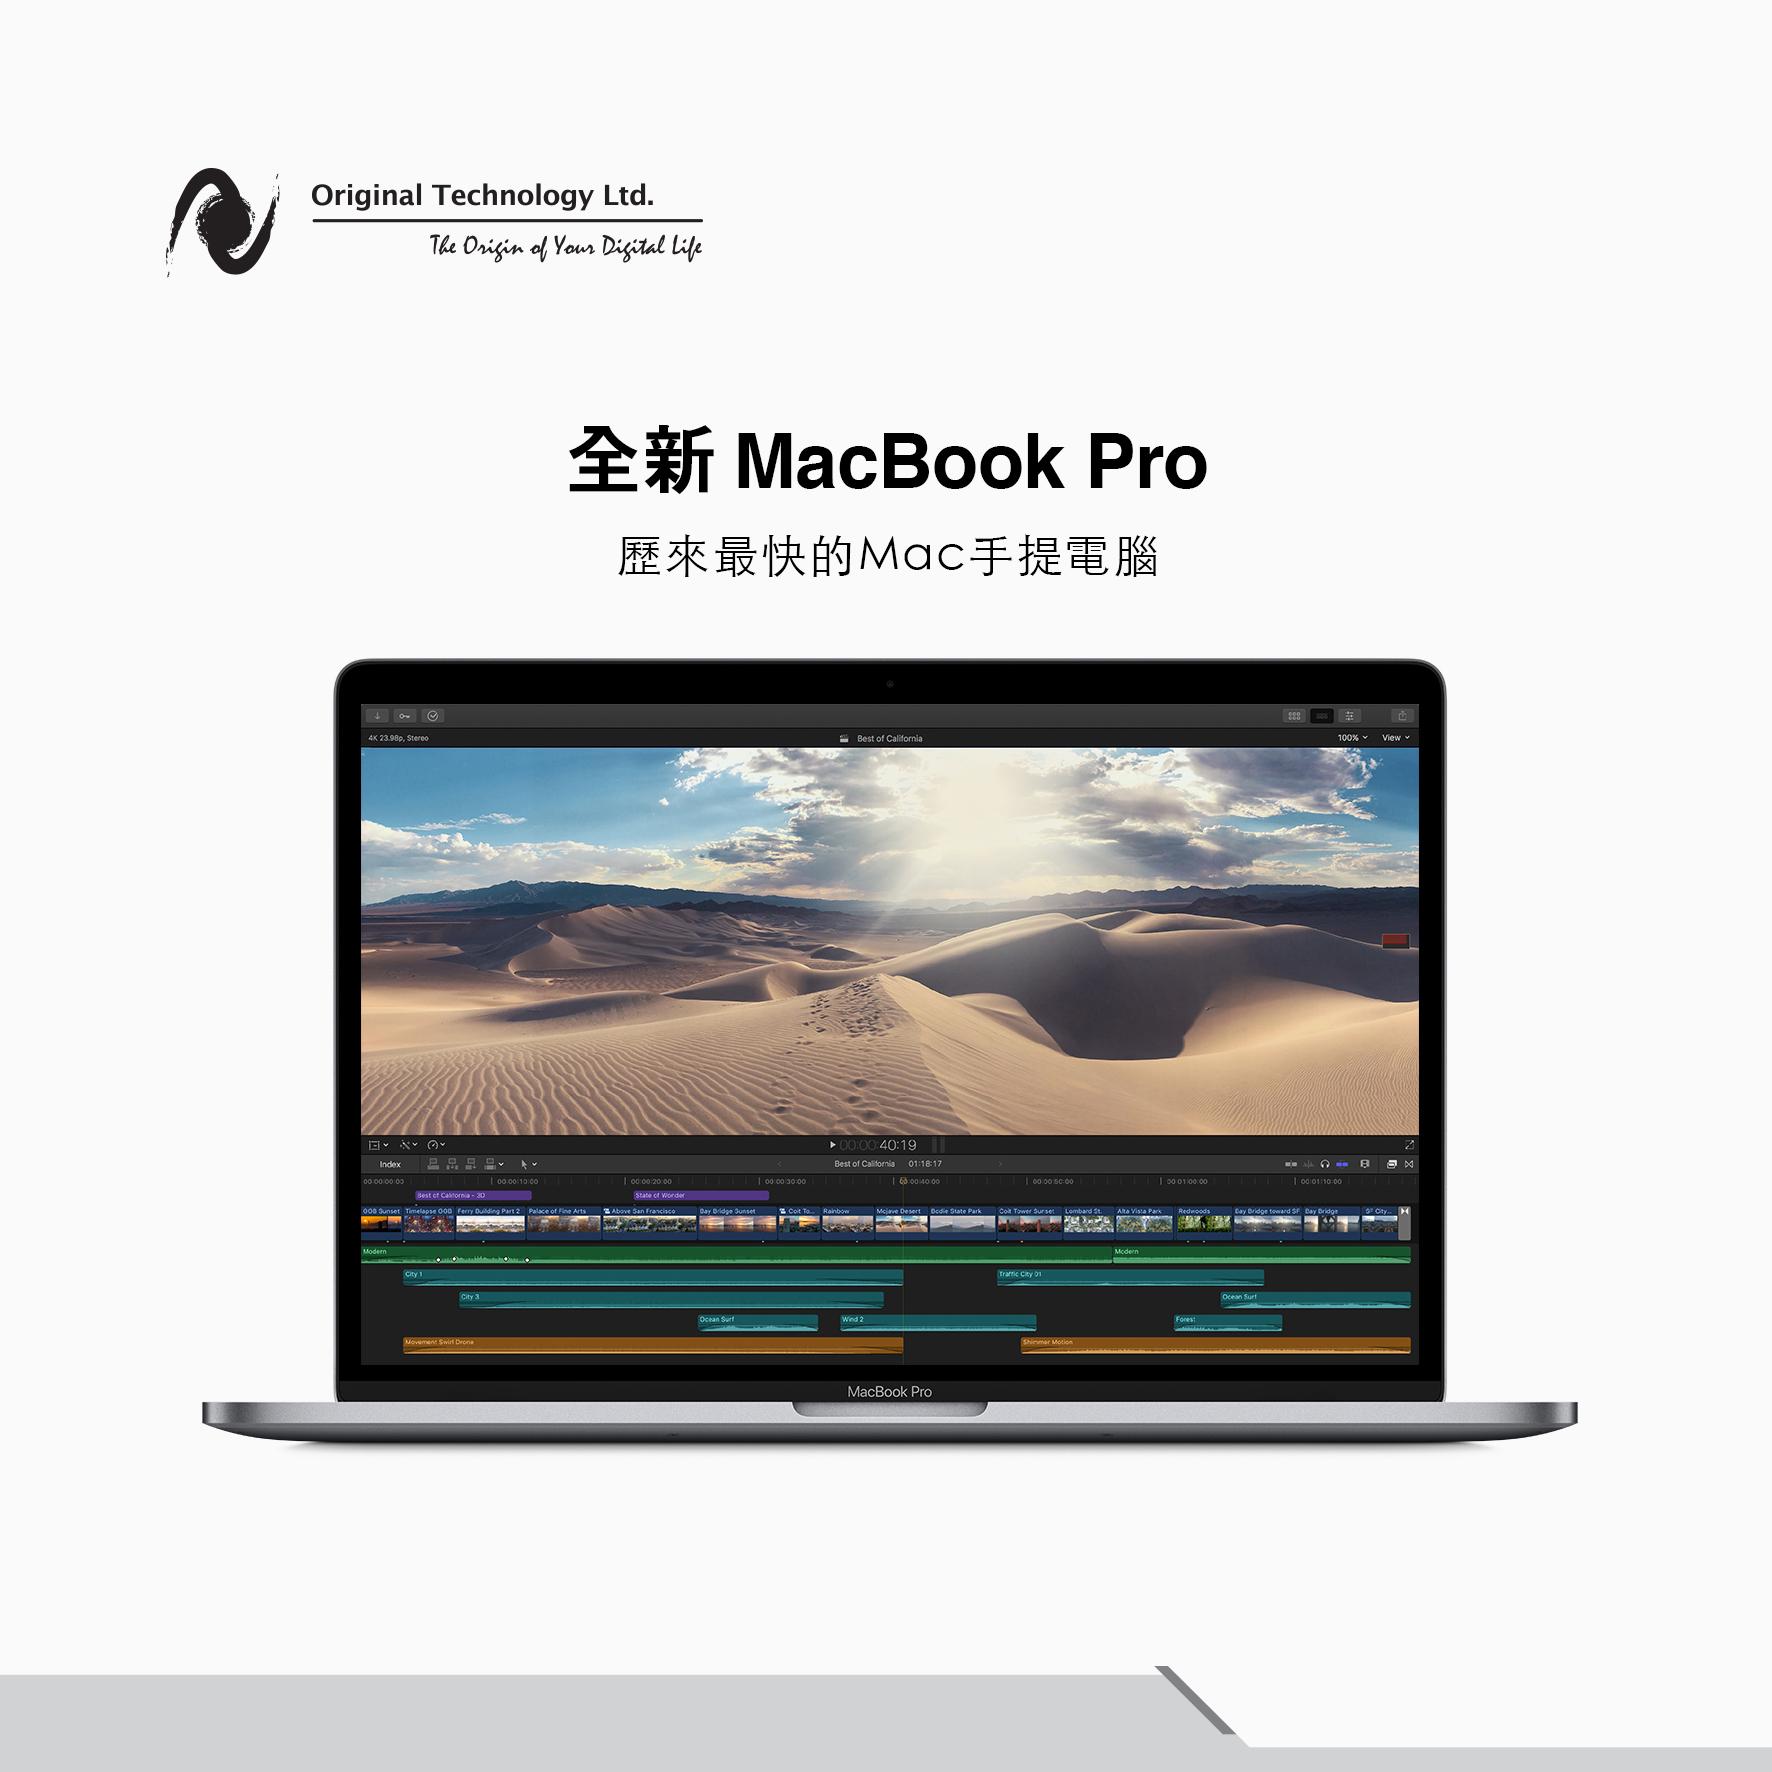 FB_New Macbook Pro.jpg